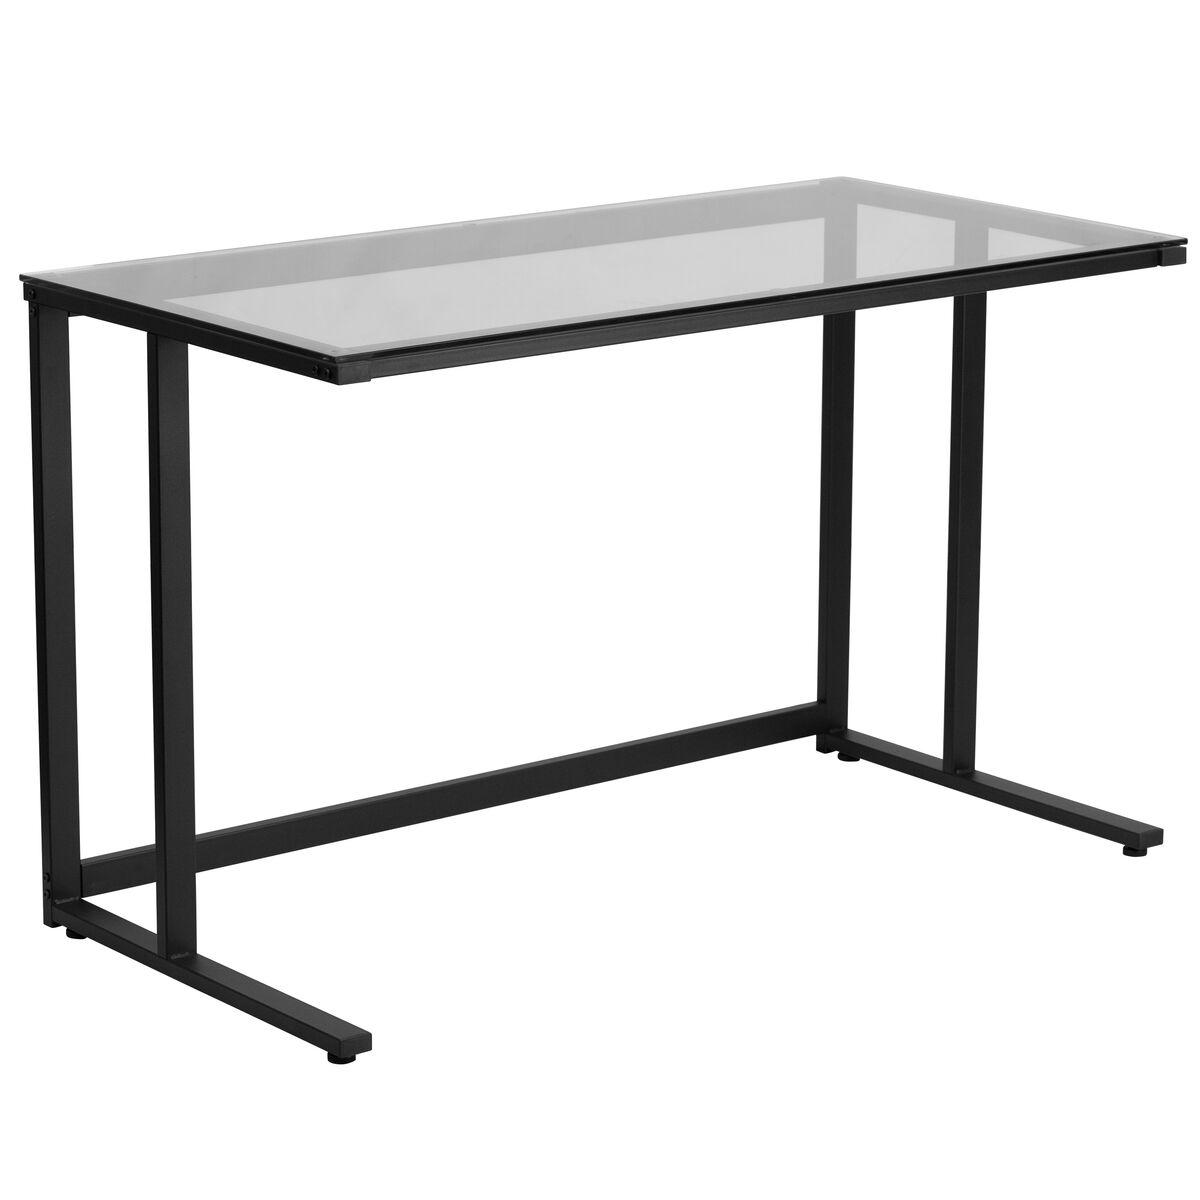 Glass Top Desk NAN-WK-055-GG | Bizchair.com